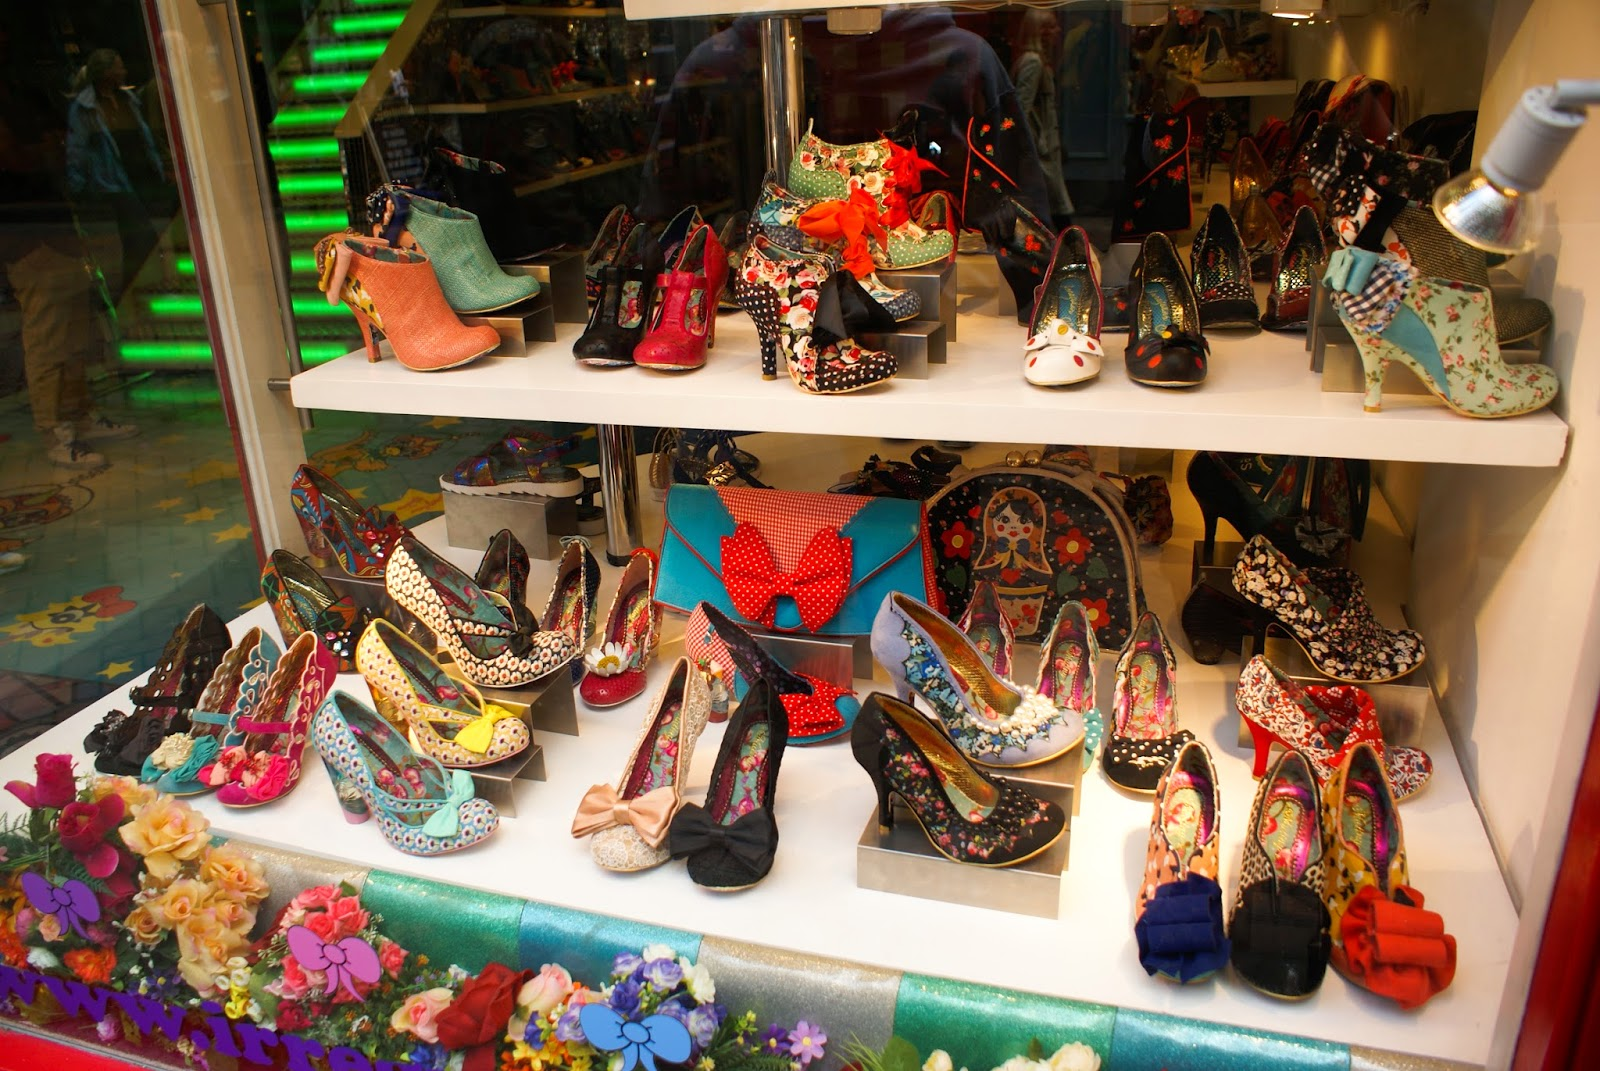 carnaby street irregular choice soho london uk england britain